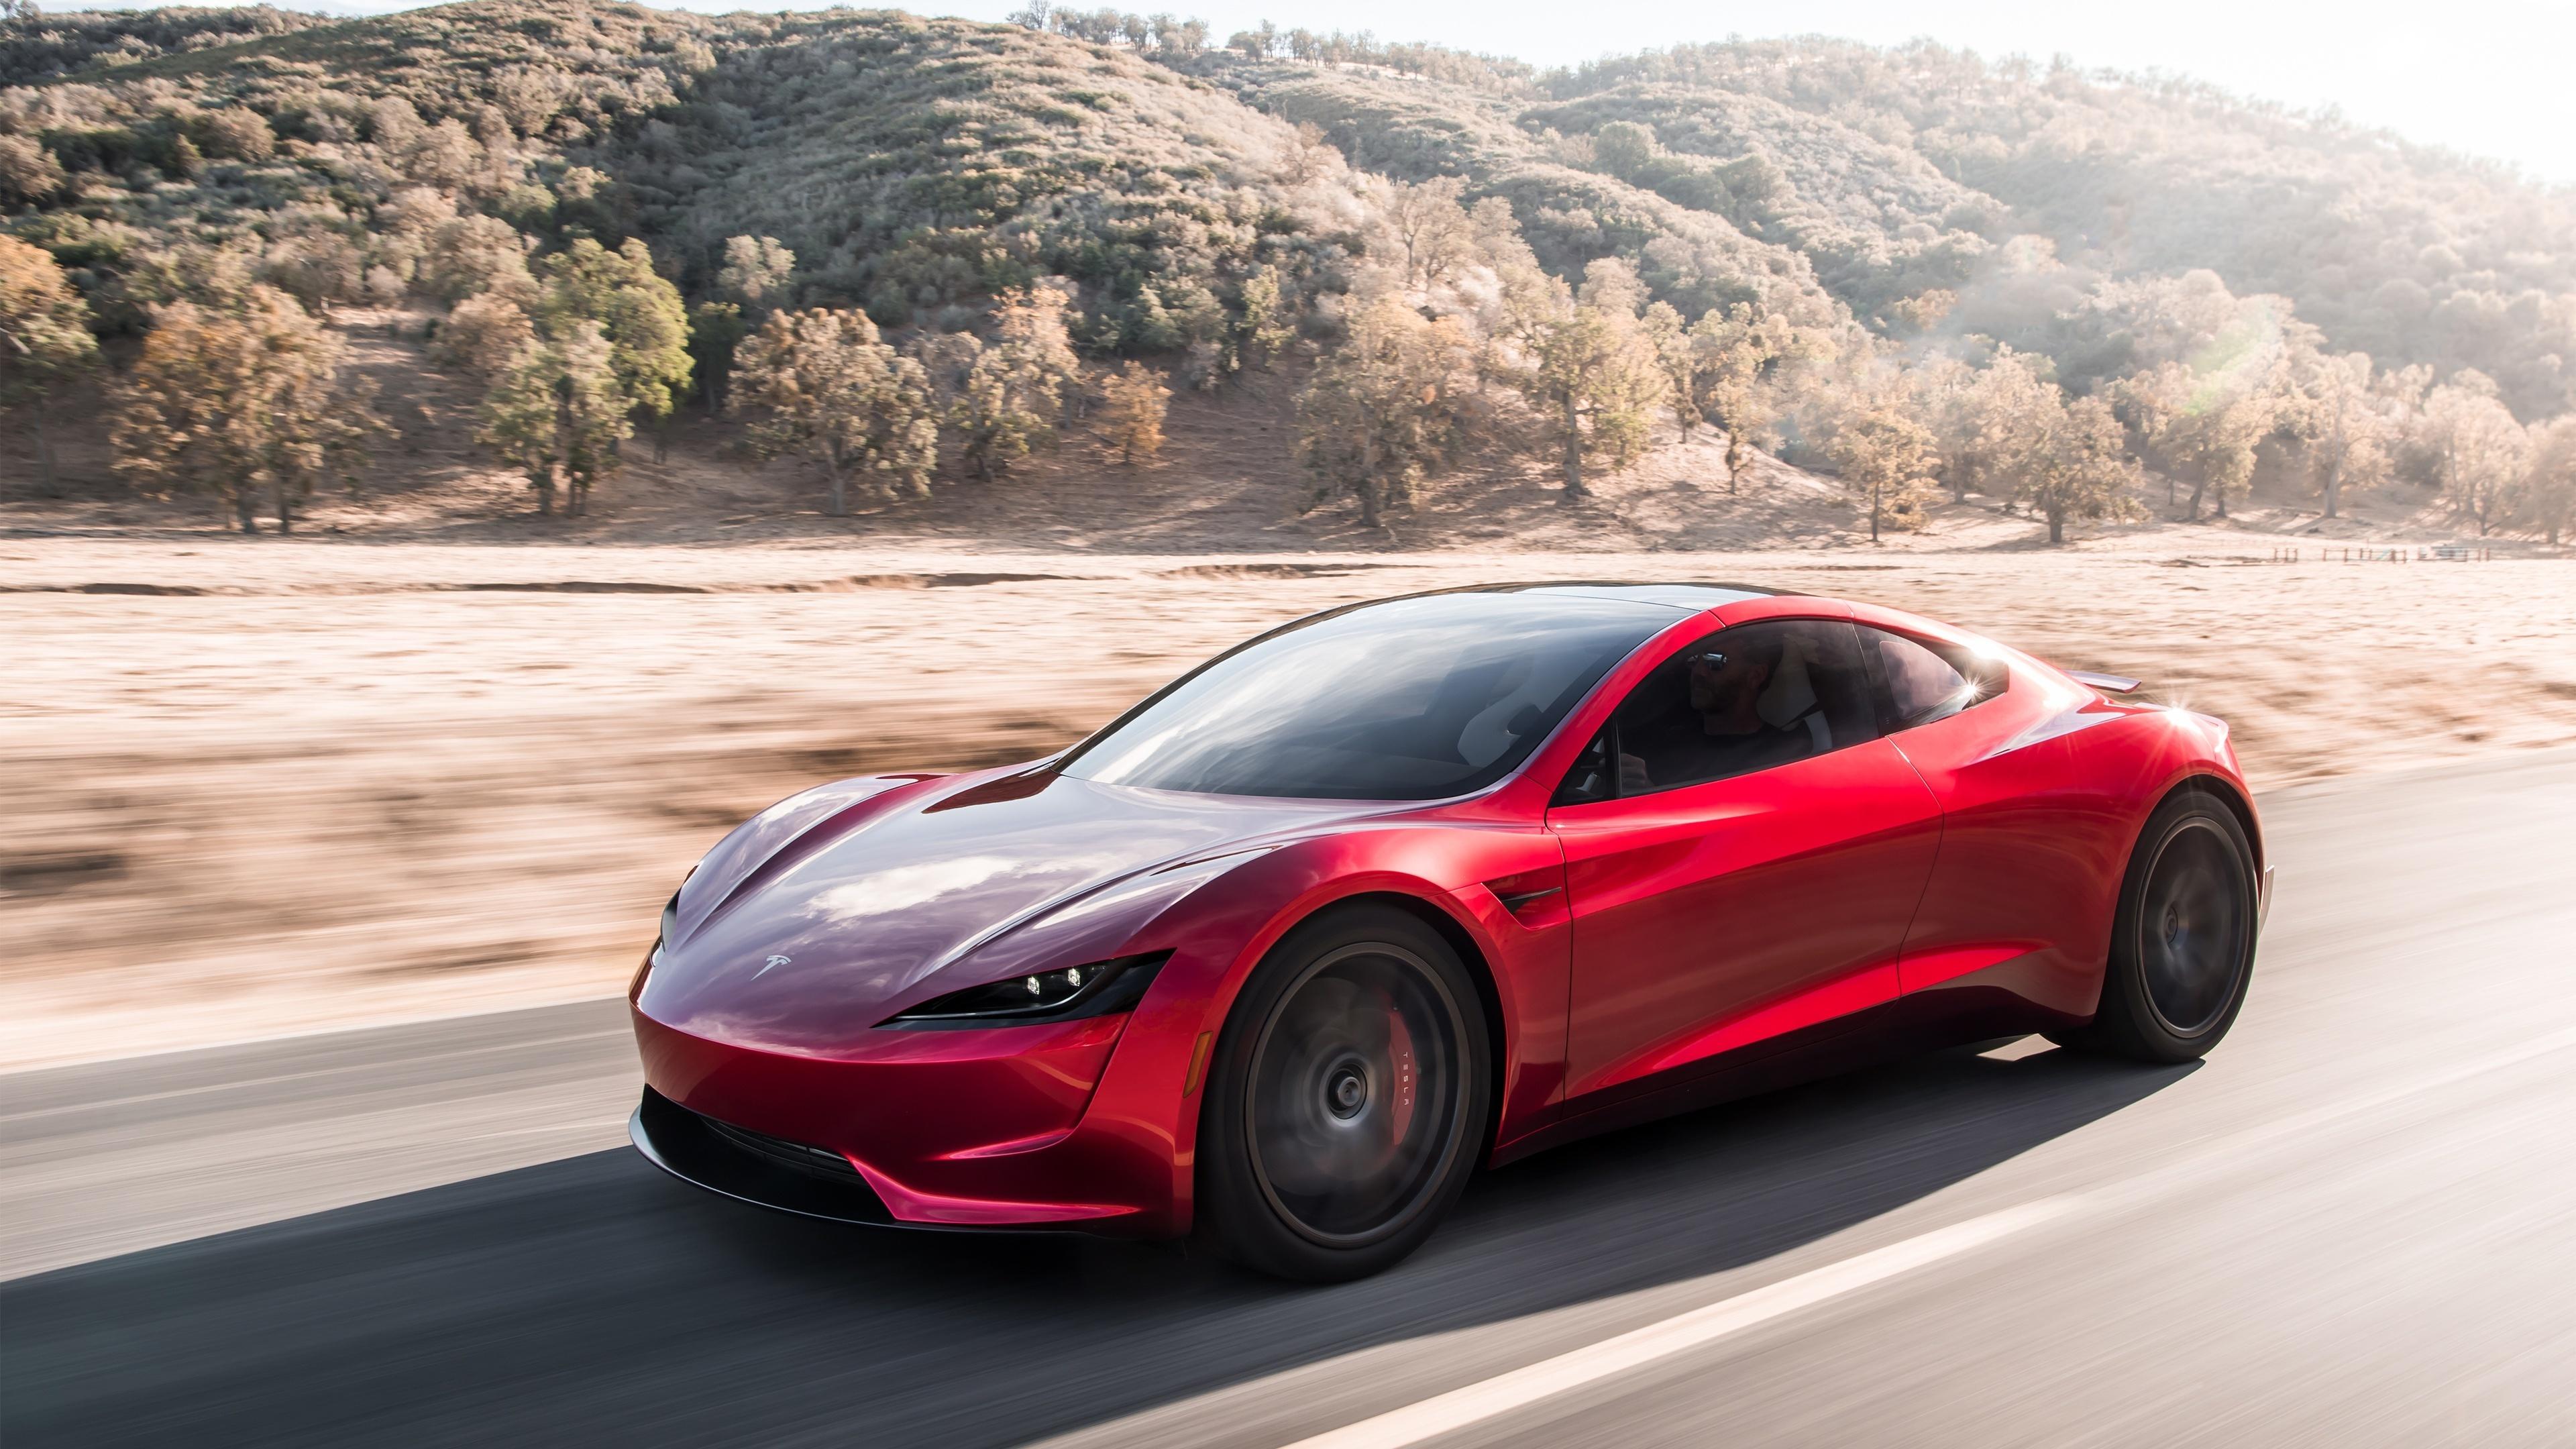 Download 3840x2400 Wallpaper Red Sports Car Tesla Roadster